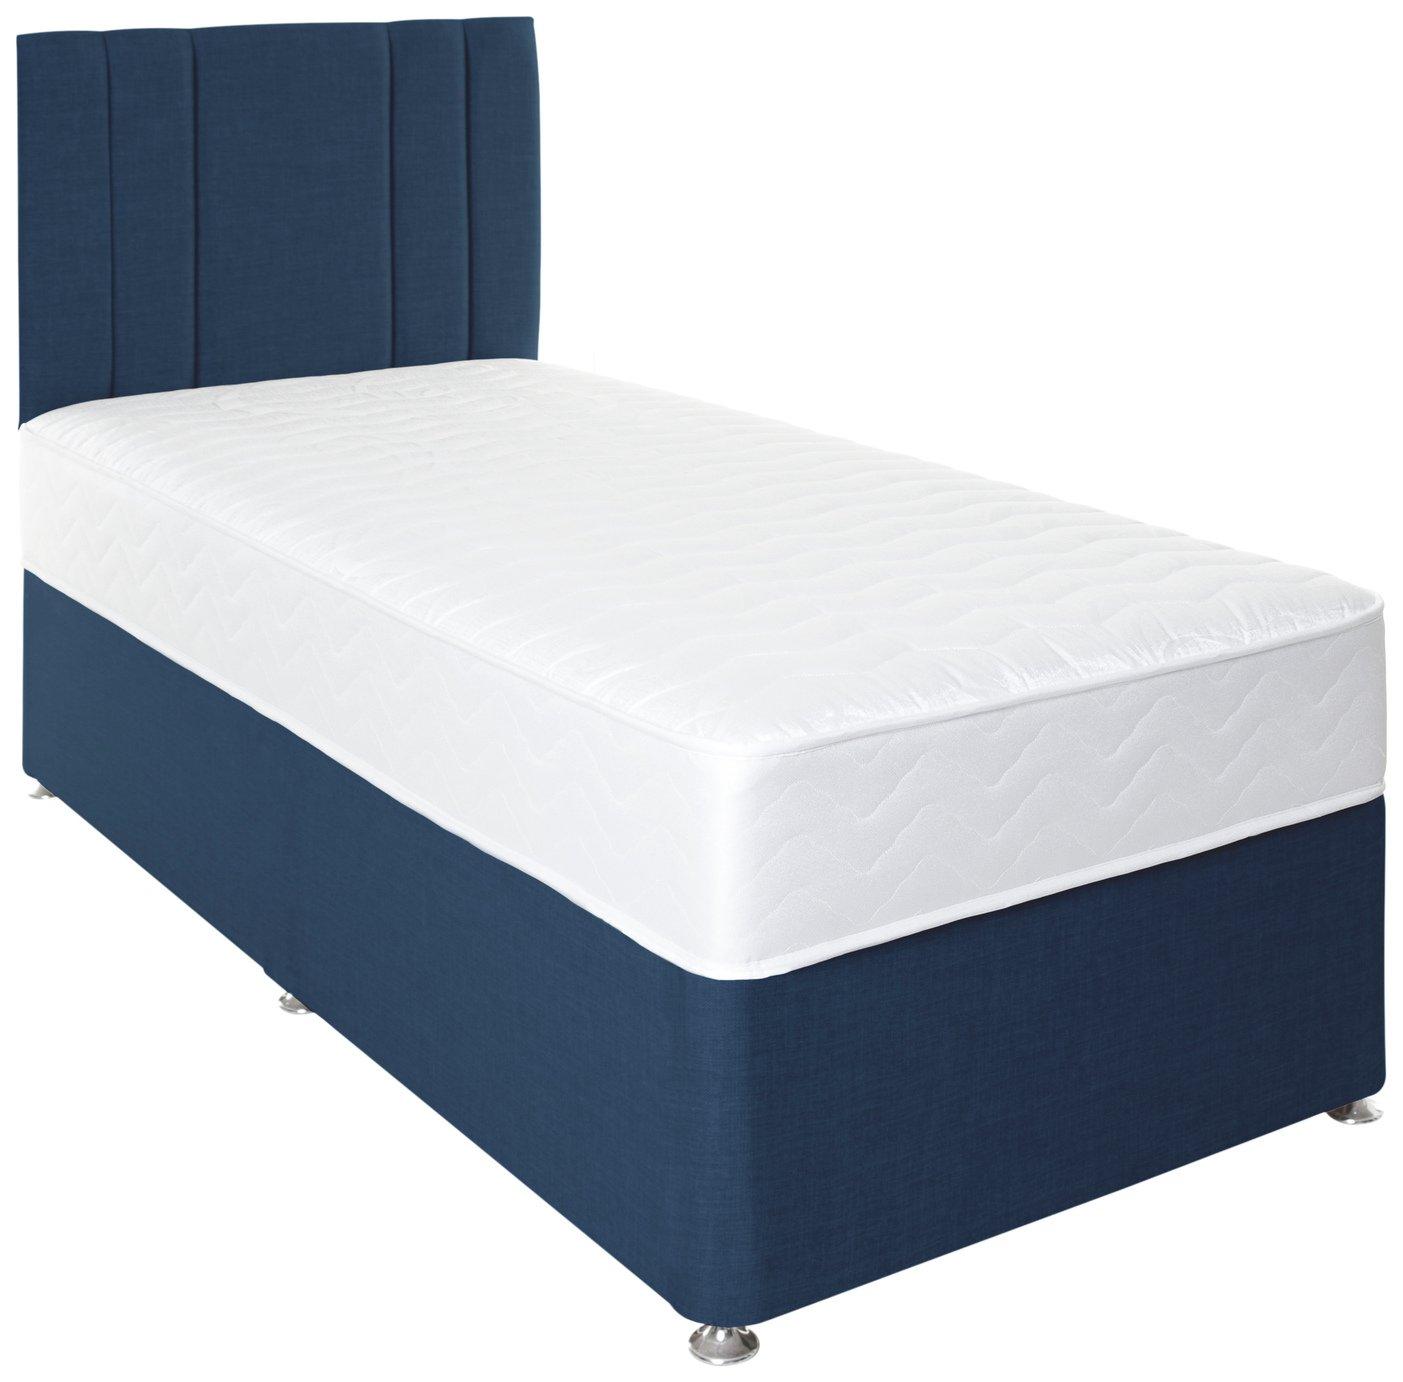 Airpsrung Henlow 1200 Memory Divan Bed and Headboard - Blue at Argos